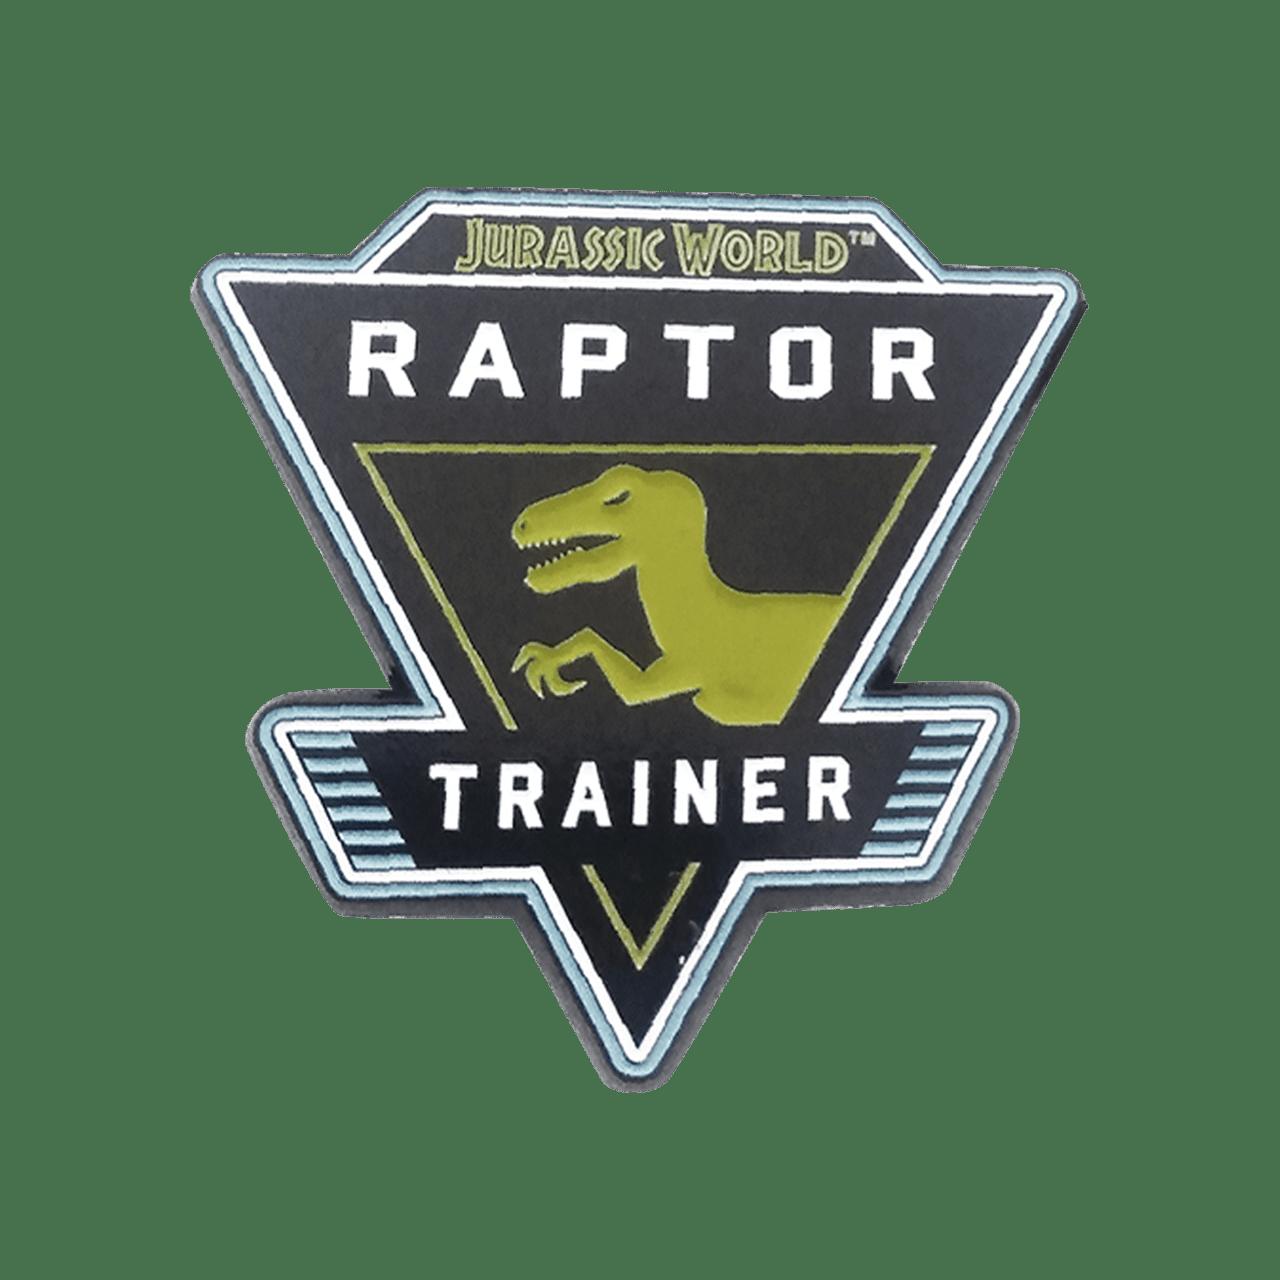 Jurassic World: Rapture Trainer Pin Badge - 2